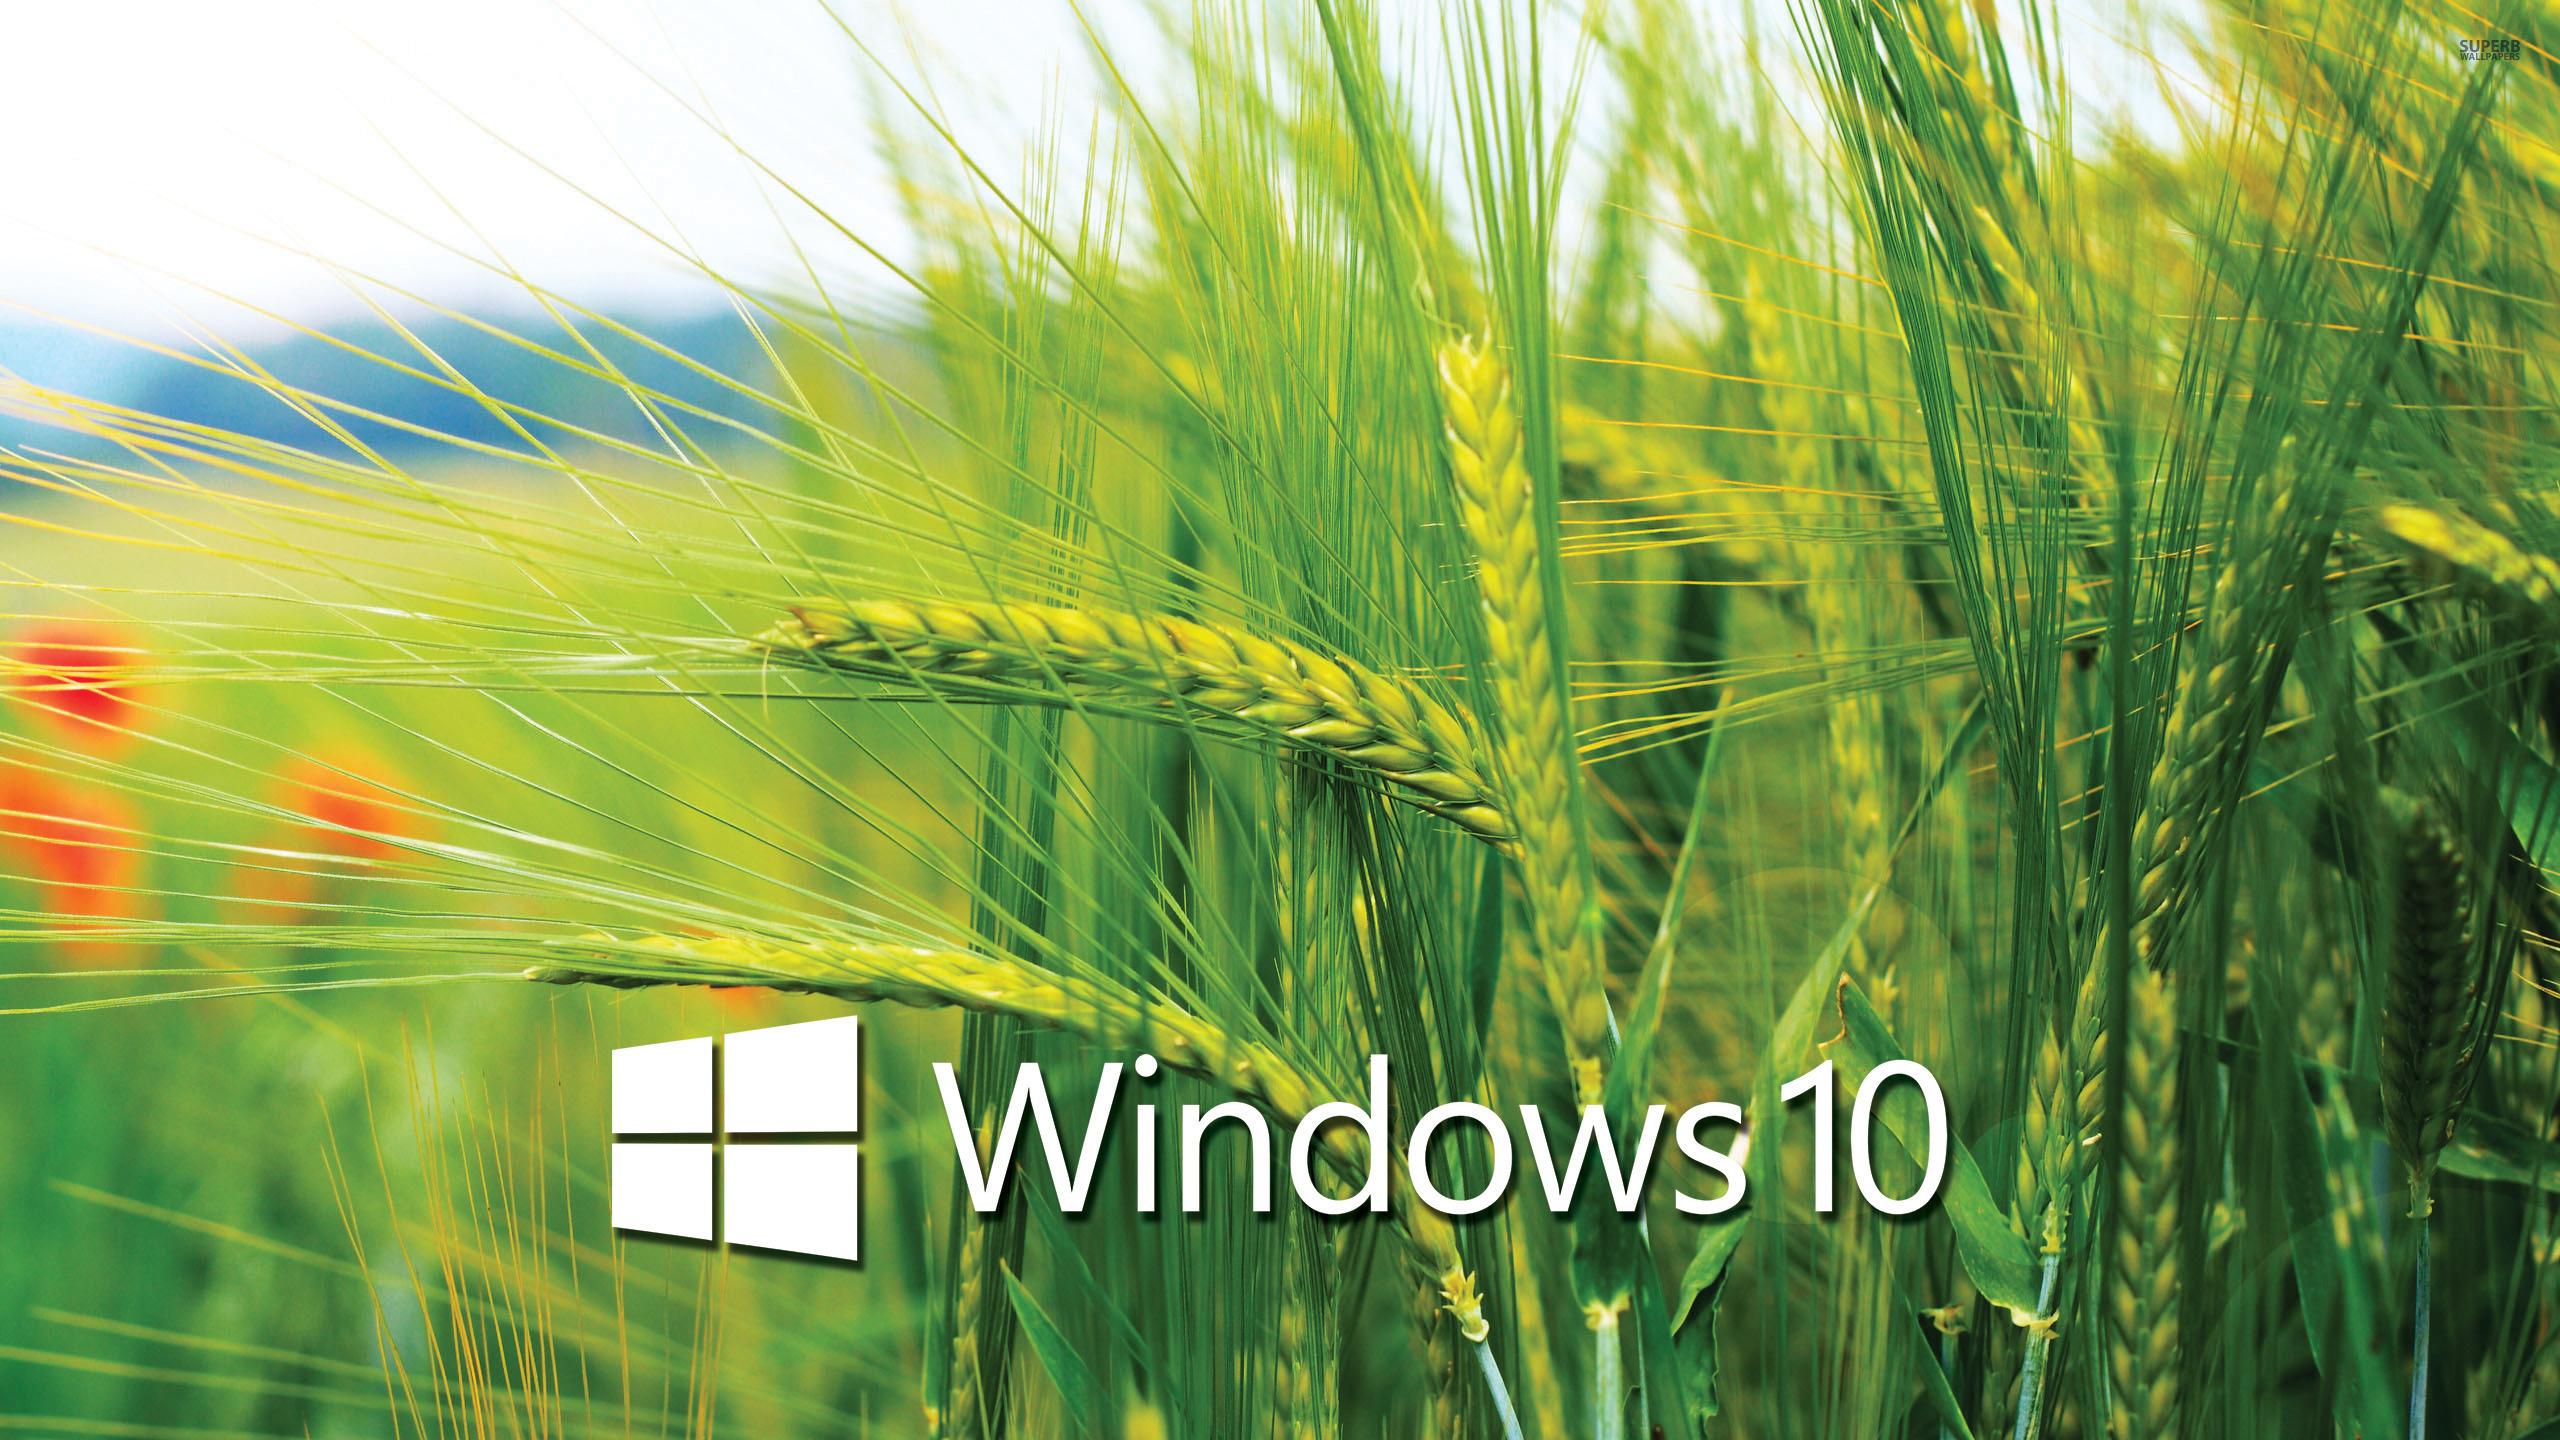 Windows 10 Wallpaper 2560x1440  WallpaperSafari